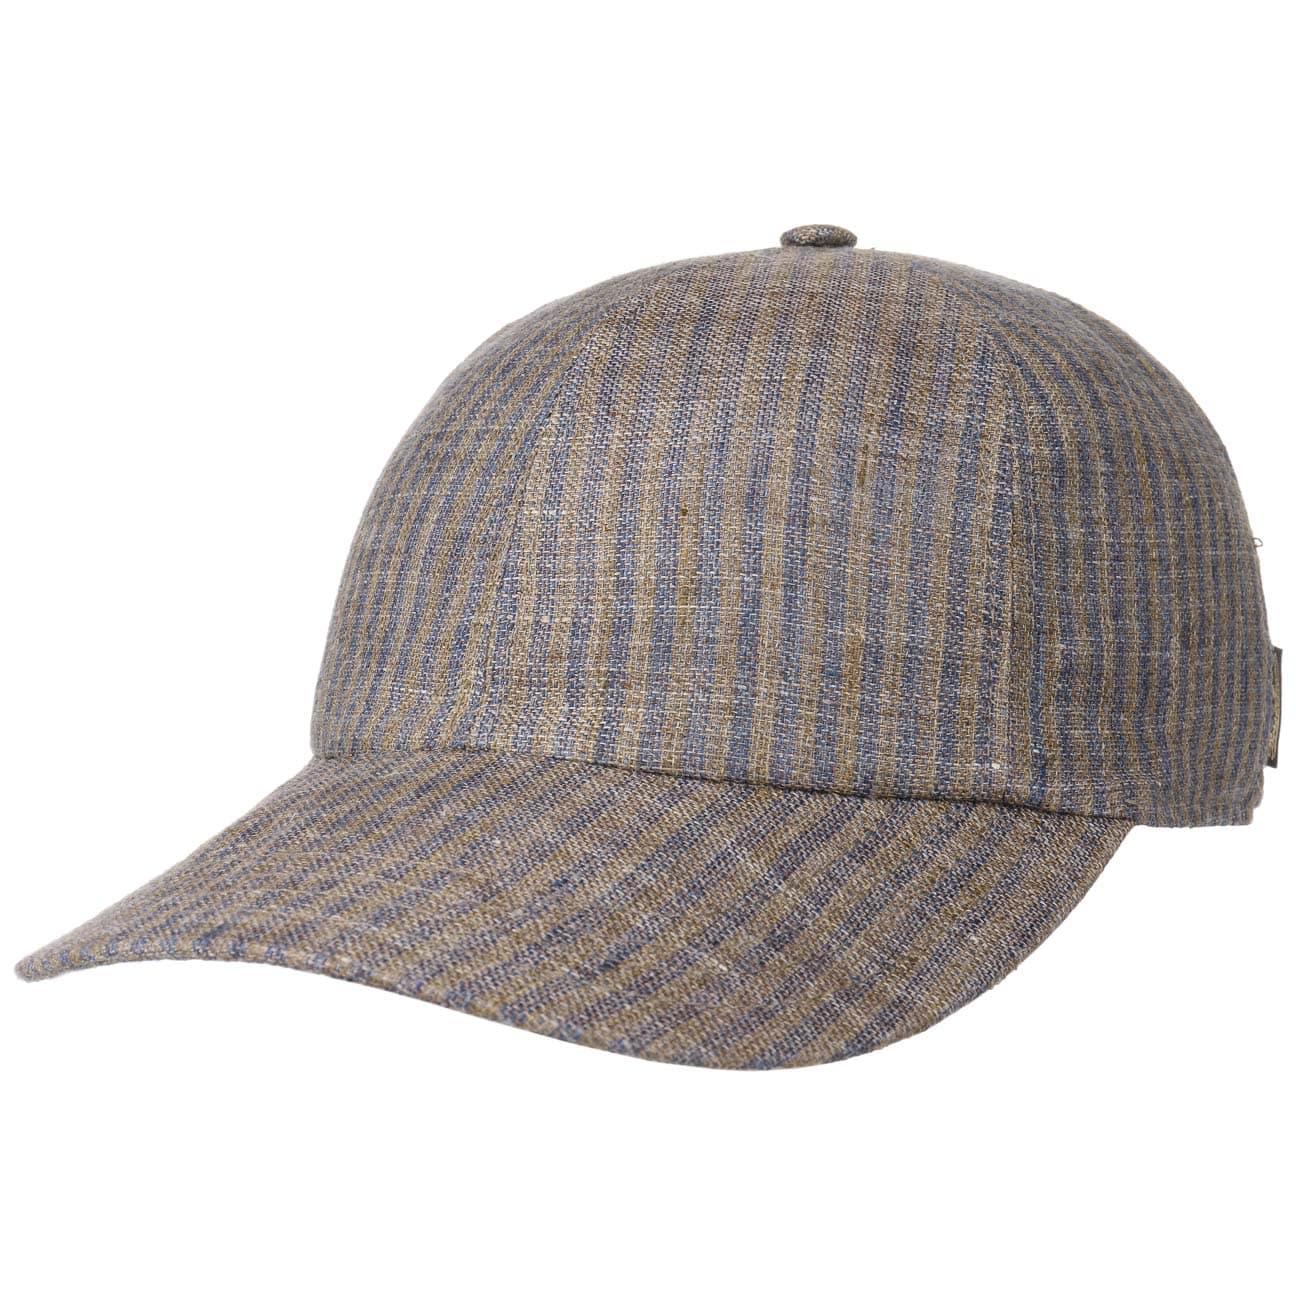 pinstripe-baseballcap-by-borsalino-cap